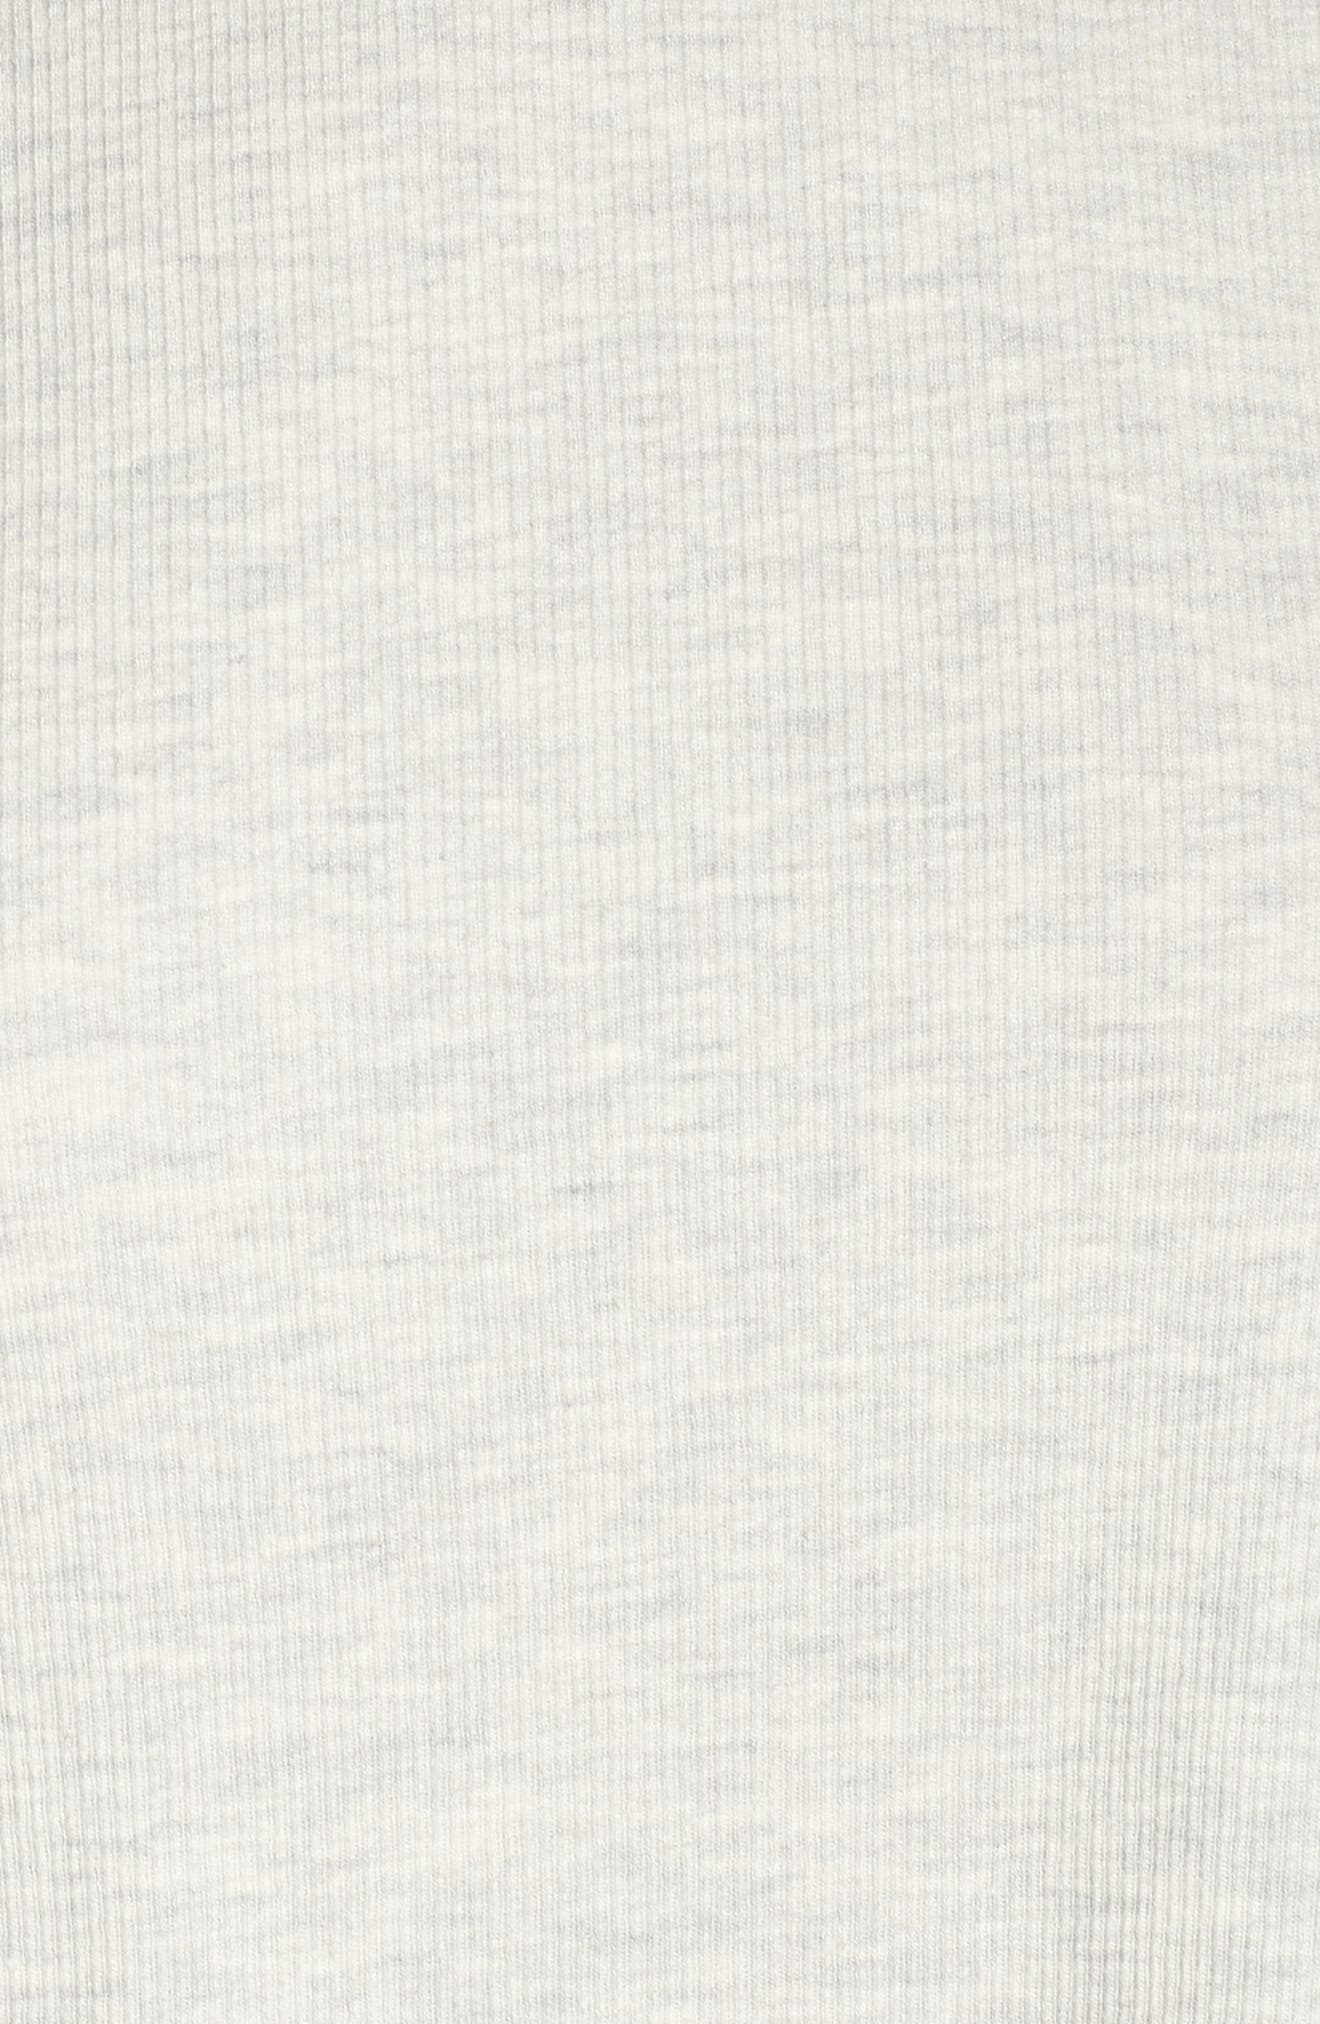 Daydream Crop Long Sleeve Tee,                             Alternate thumbnail 5, color,                             GREY HEATHER